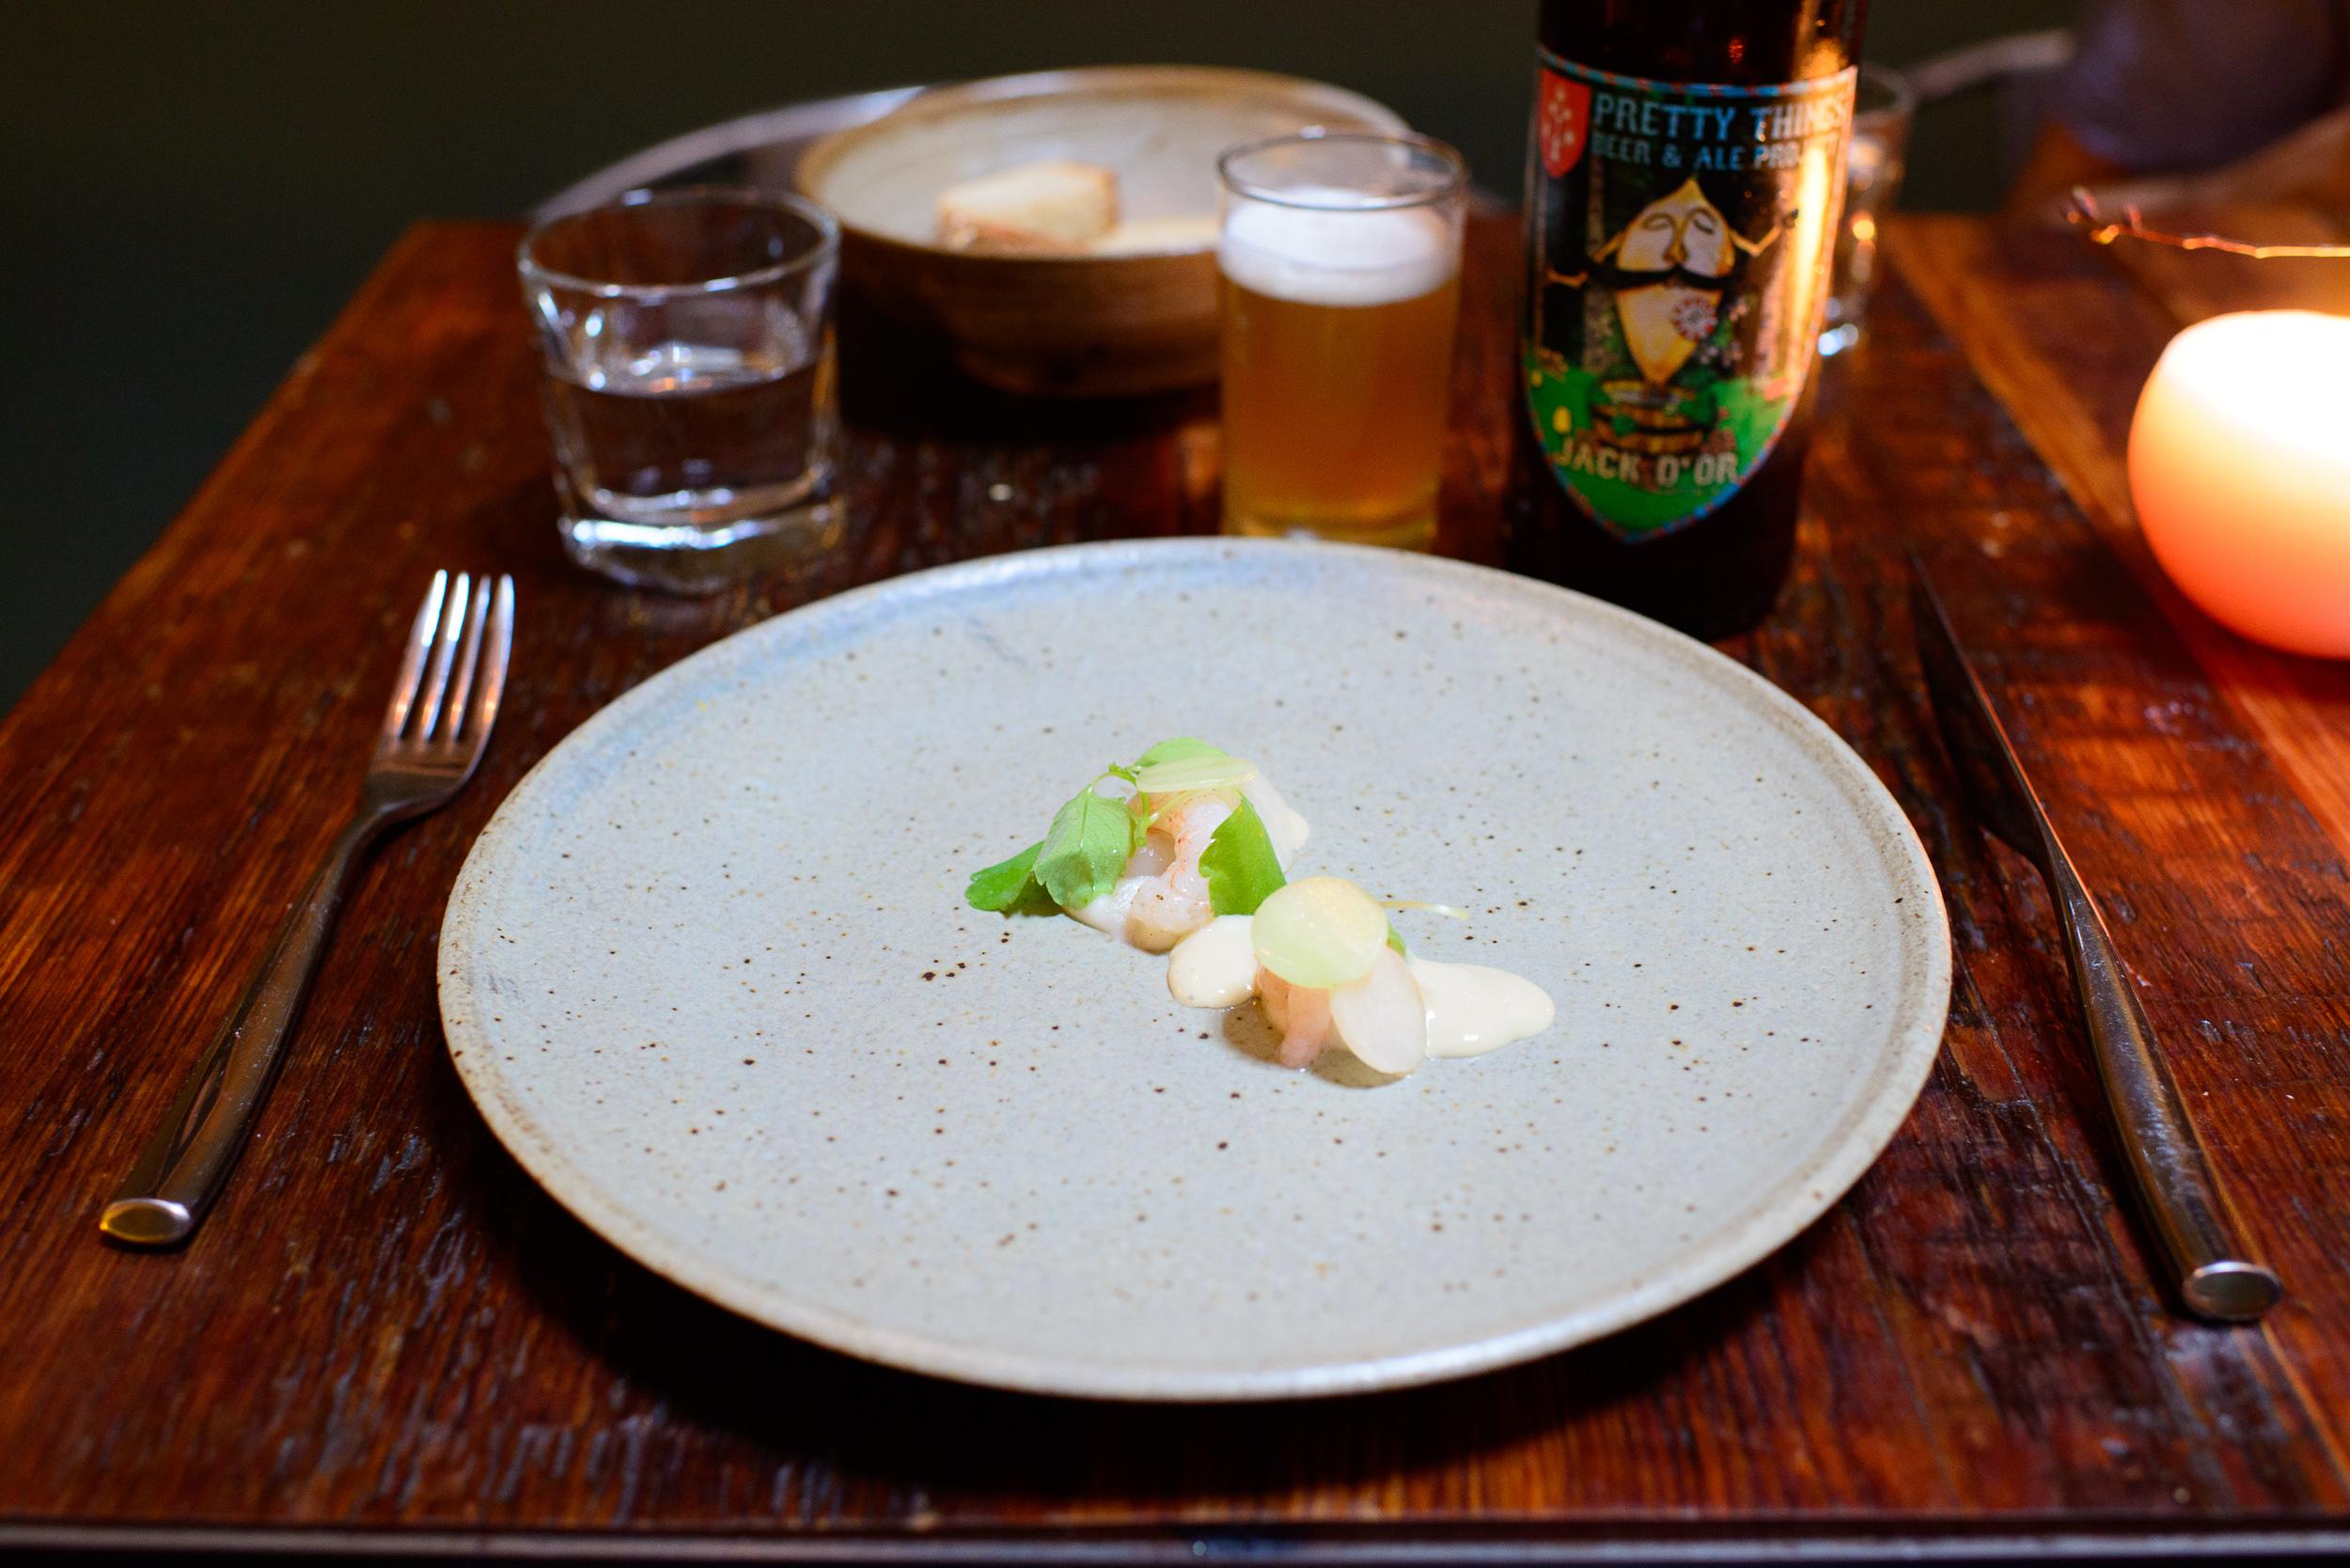 1st Course: Maine shrimp - kohlrabi, cucumber, oyster cream